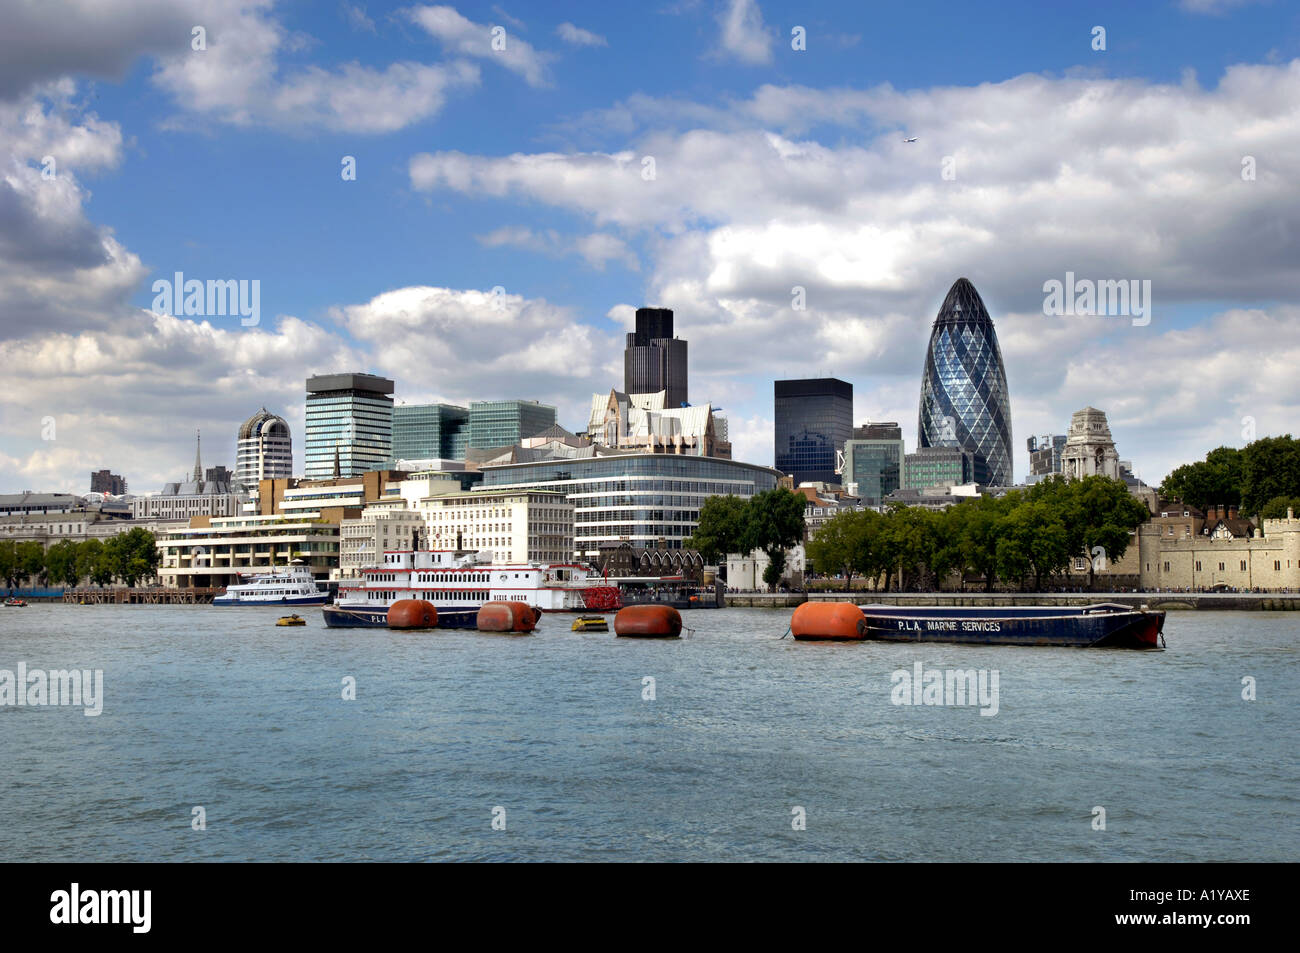 Ville de London Skyline Photo Stock